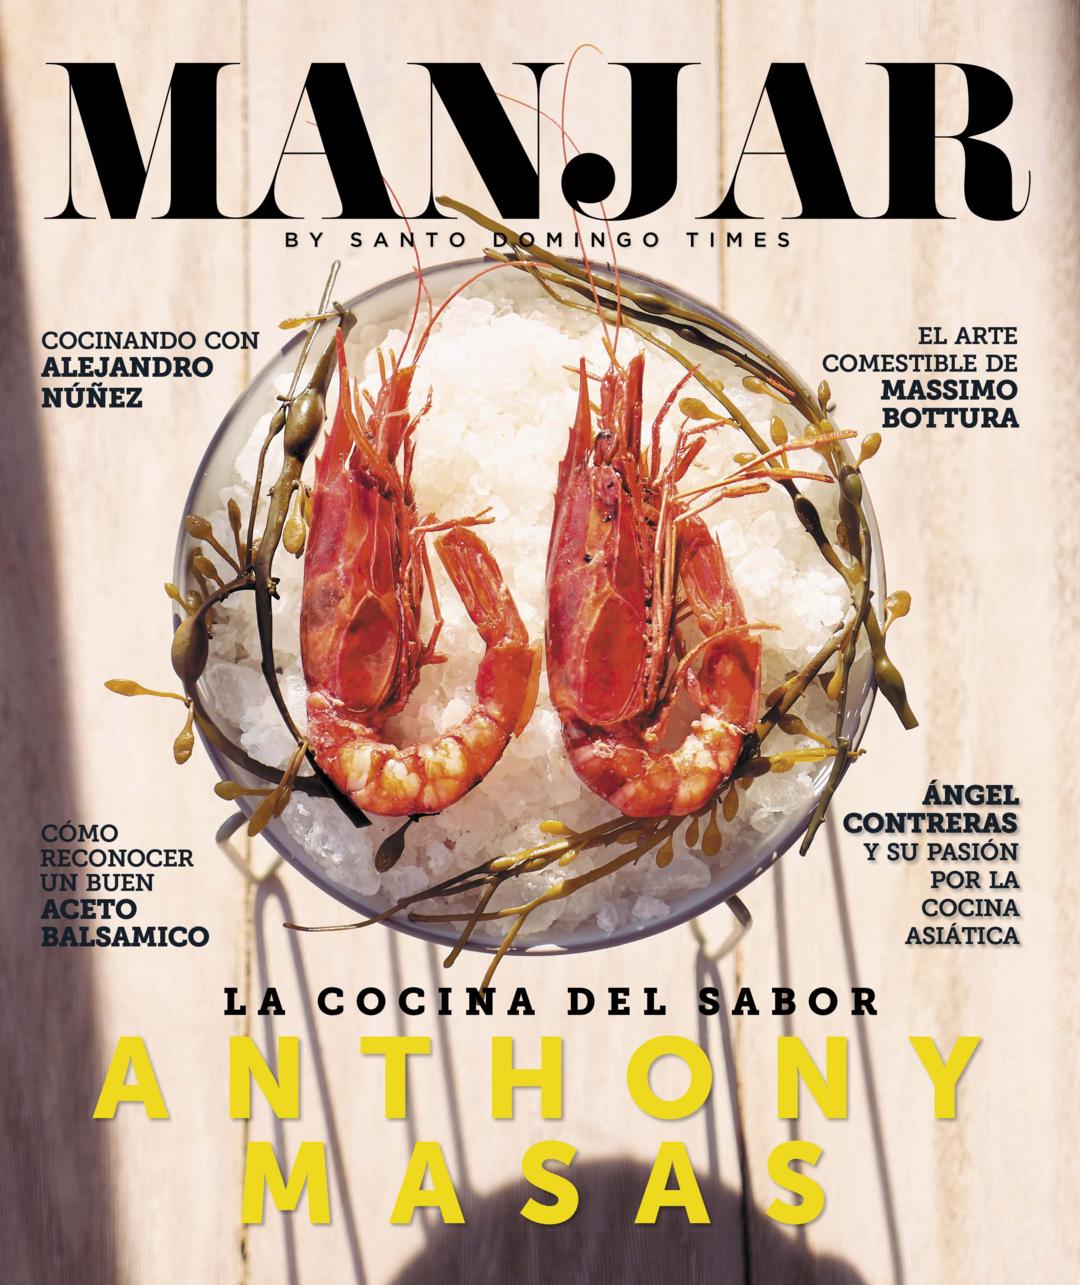 Page 1 of Manjar con Anthony Masas